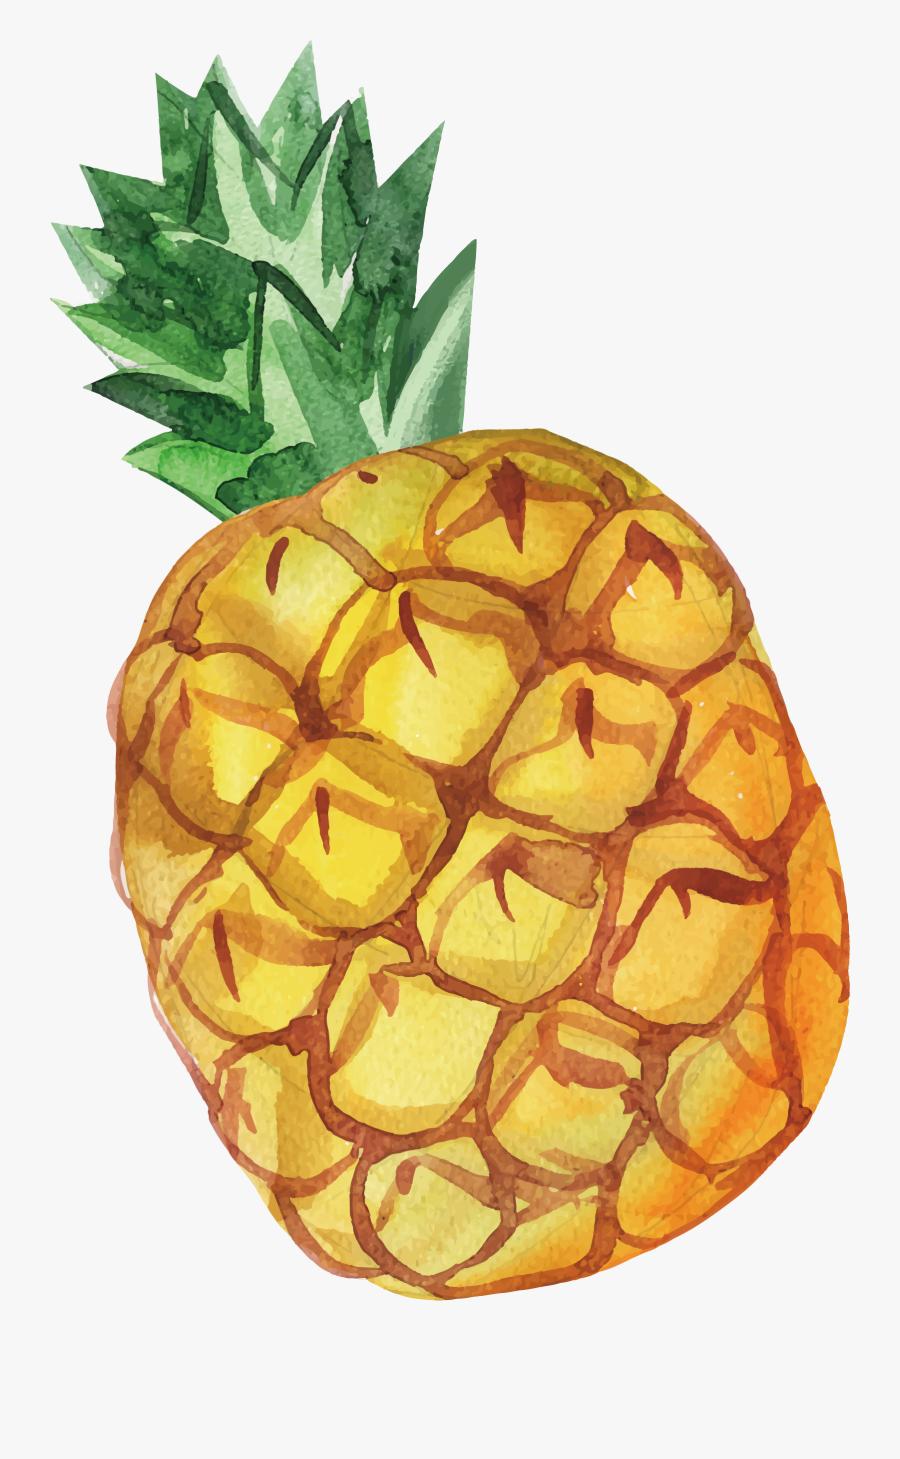 Juice Pineapple Computer File - Pineapple, Transparent Clipart